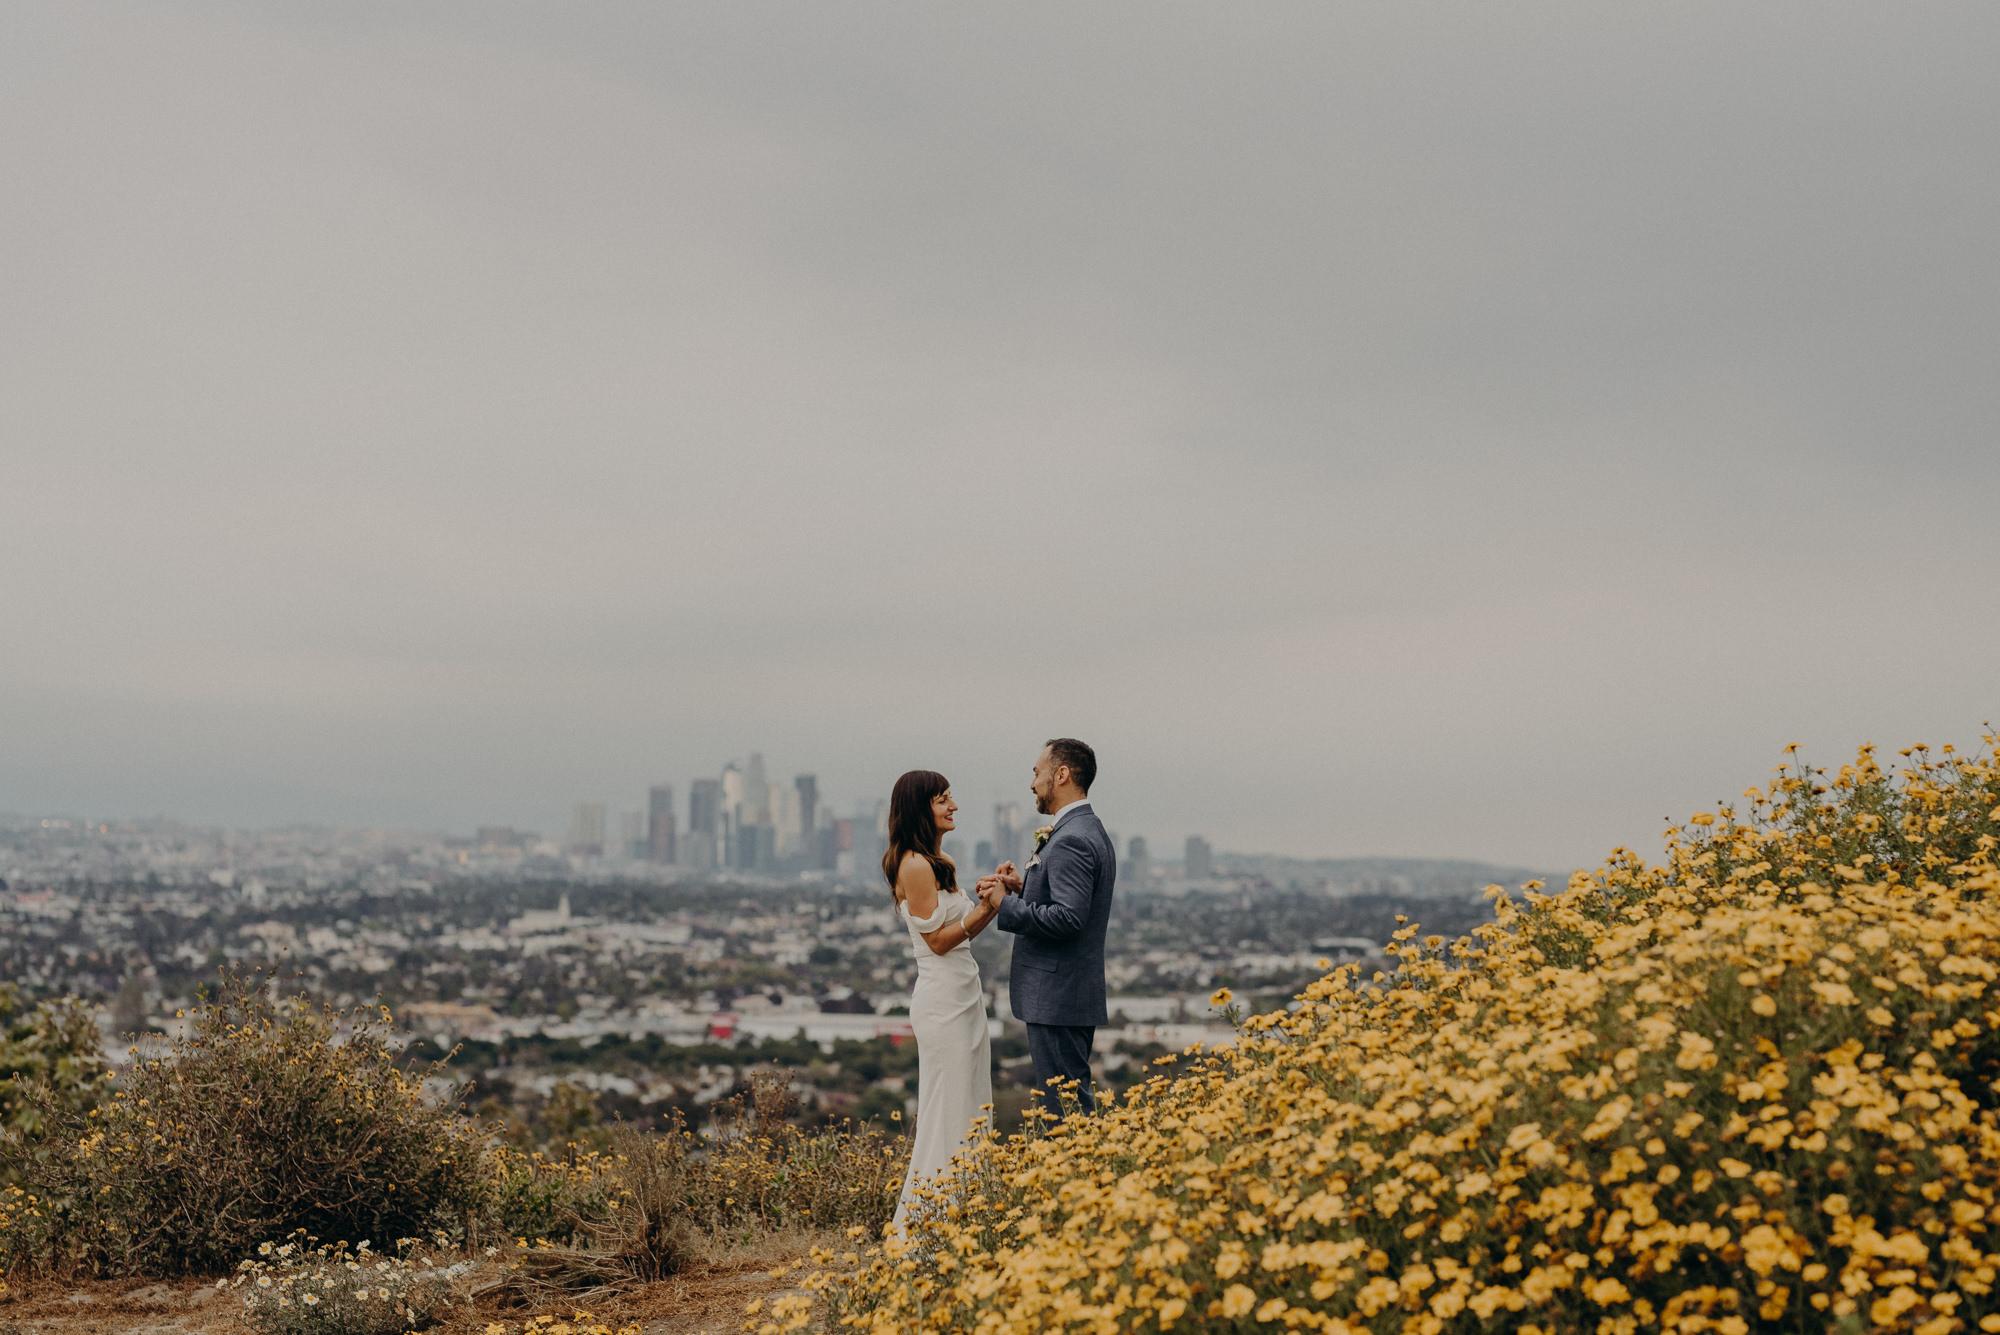 elopement photographer in los angeles - la wedding photographer - isaiahandtaylor.com-053.jpg